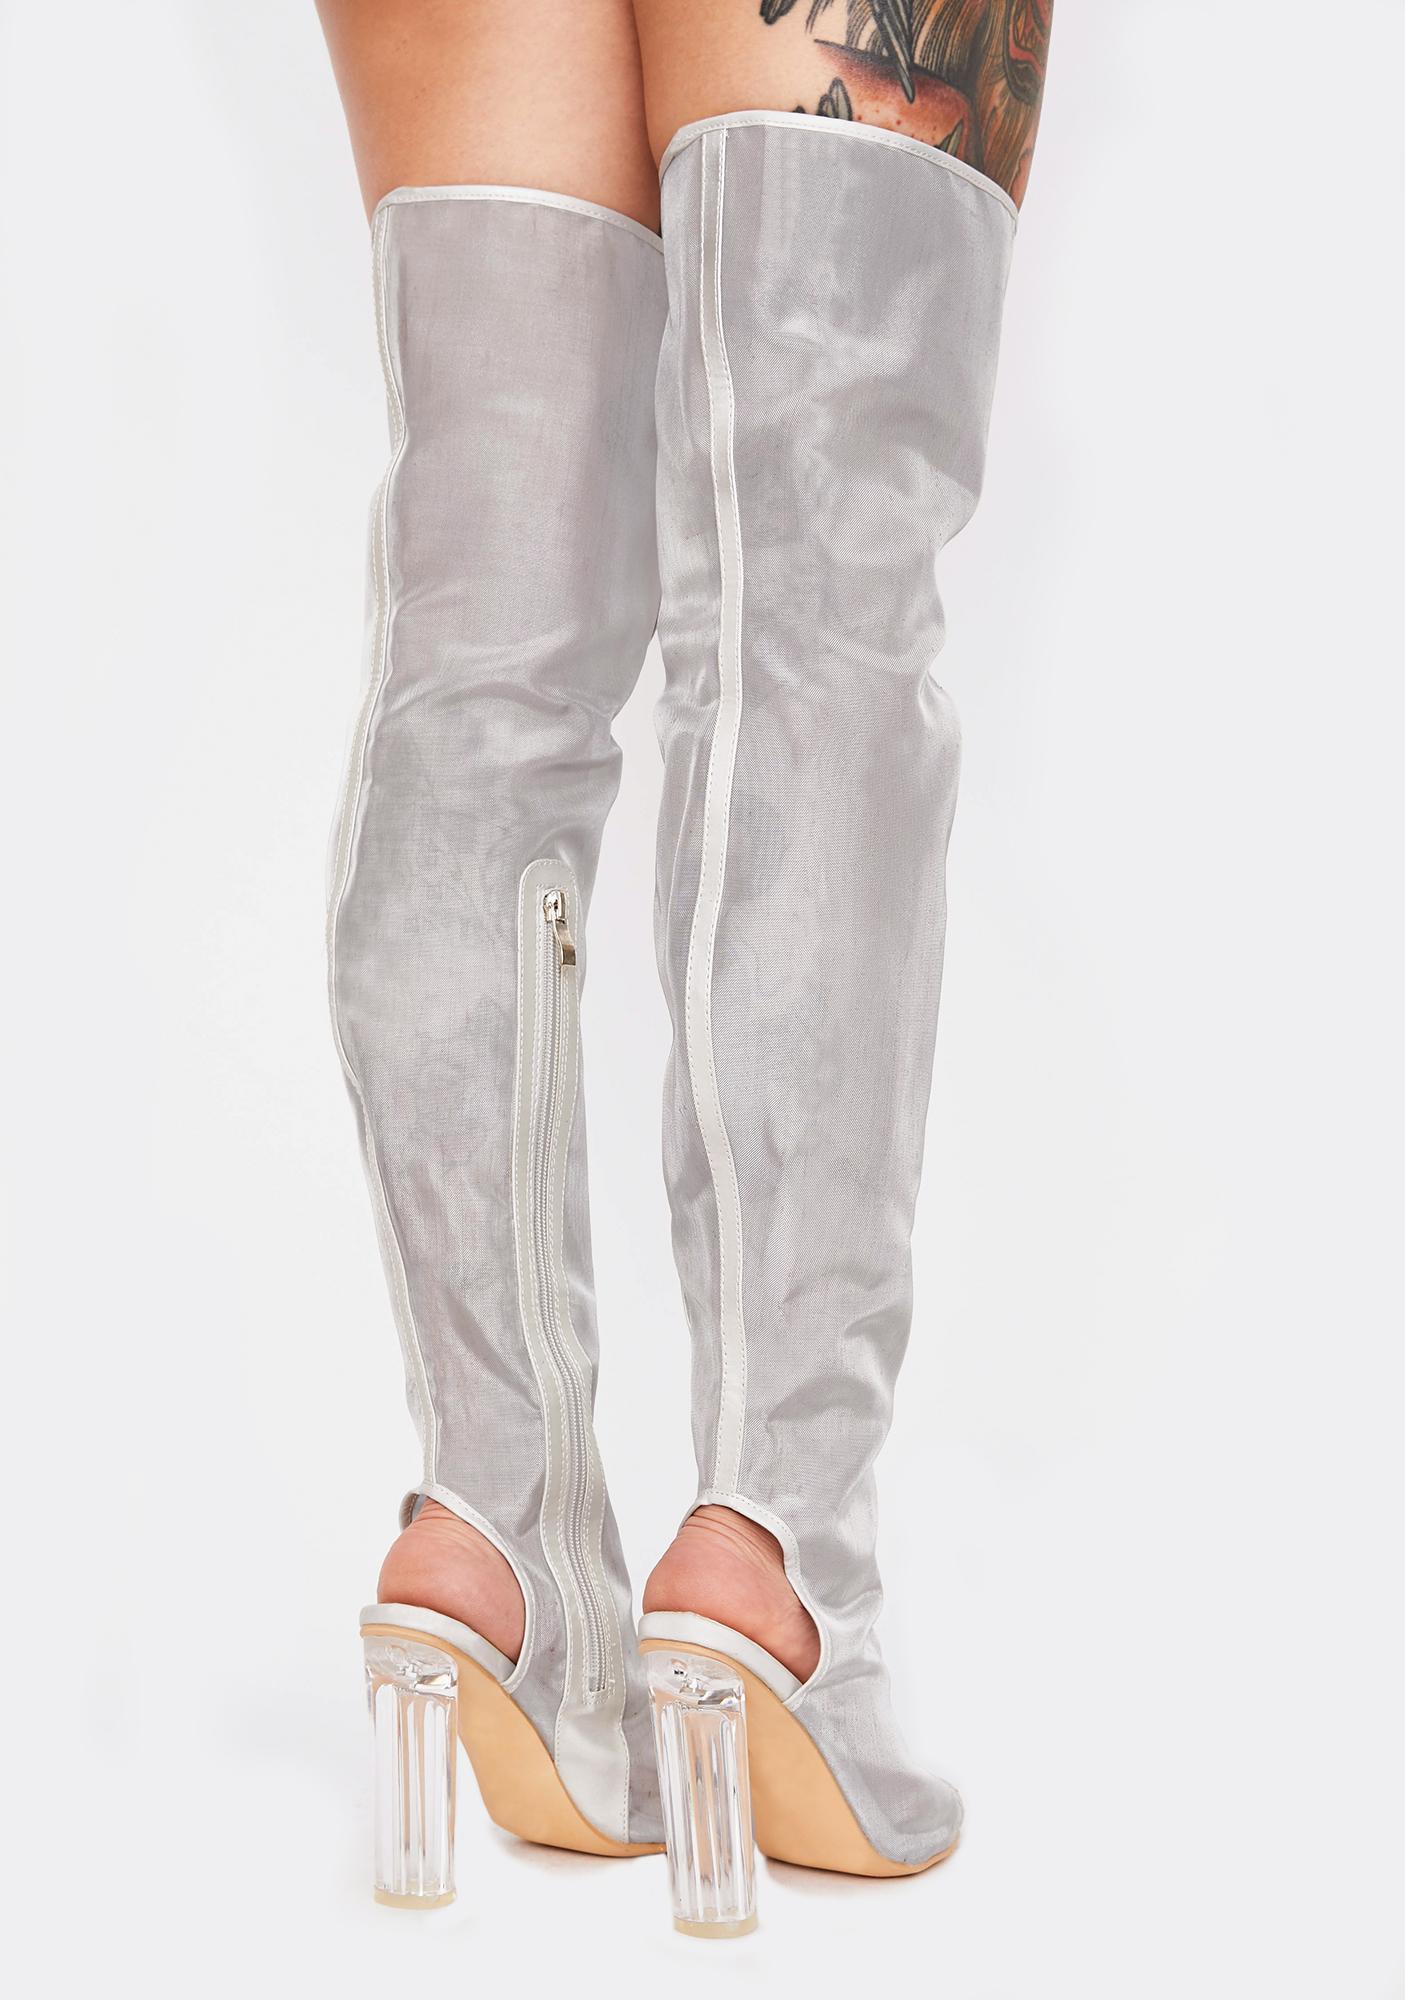 Drama Shield Thigh High Boots